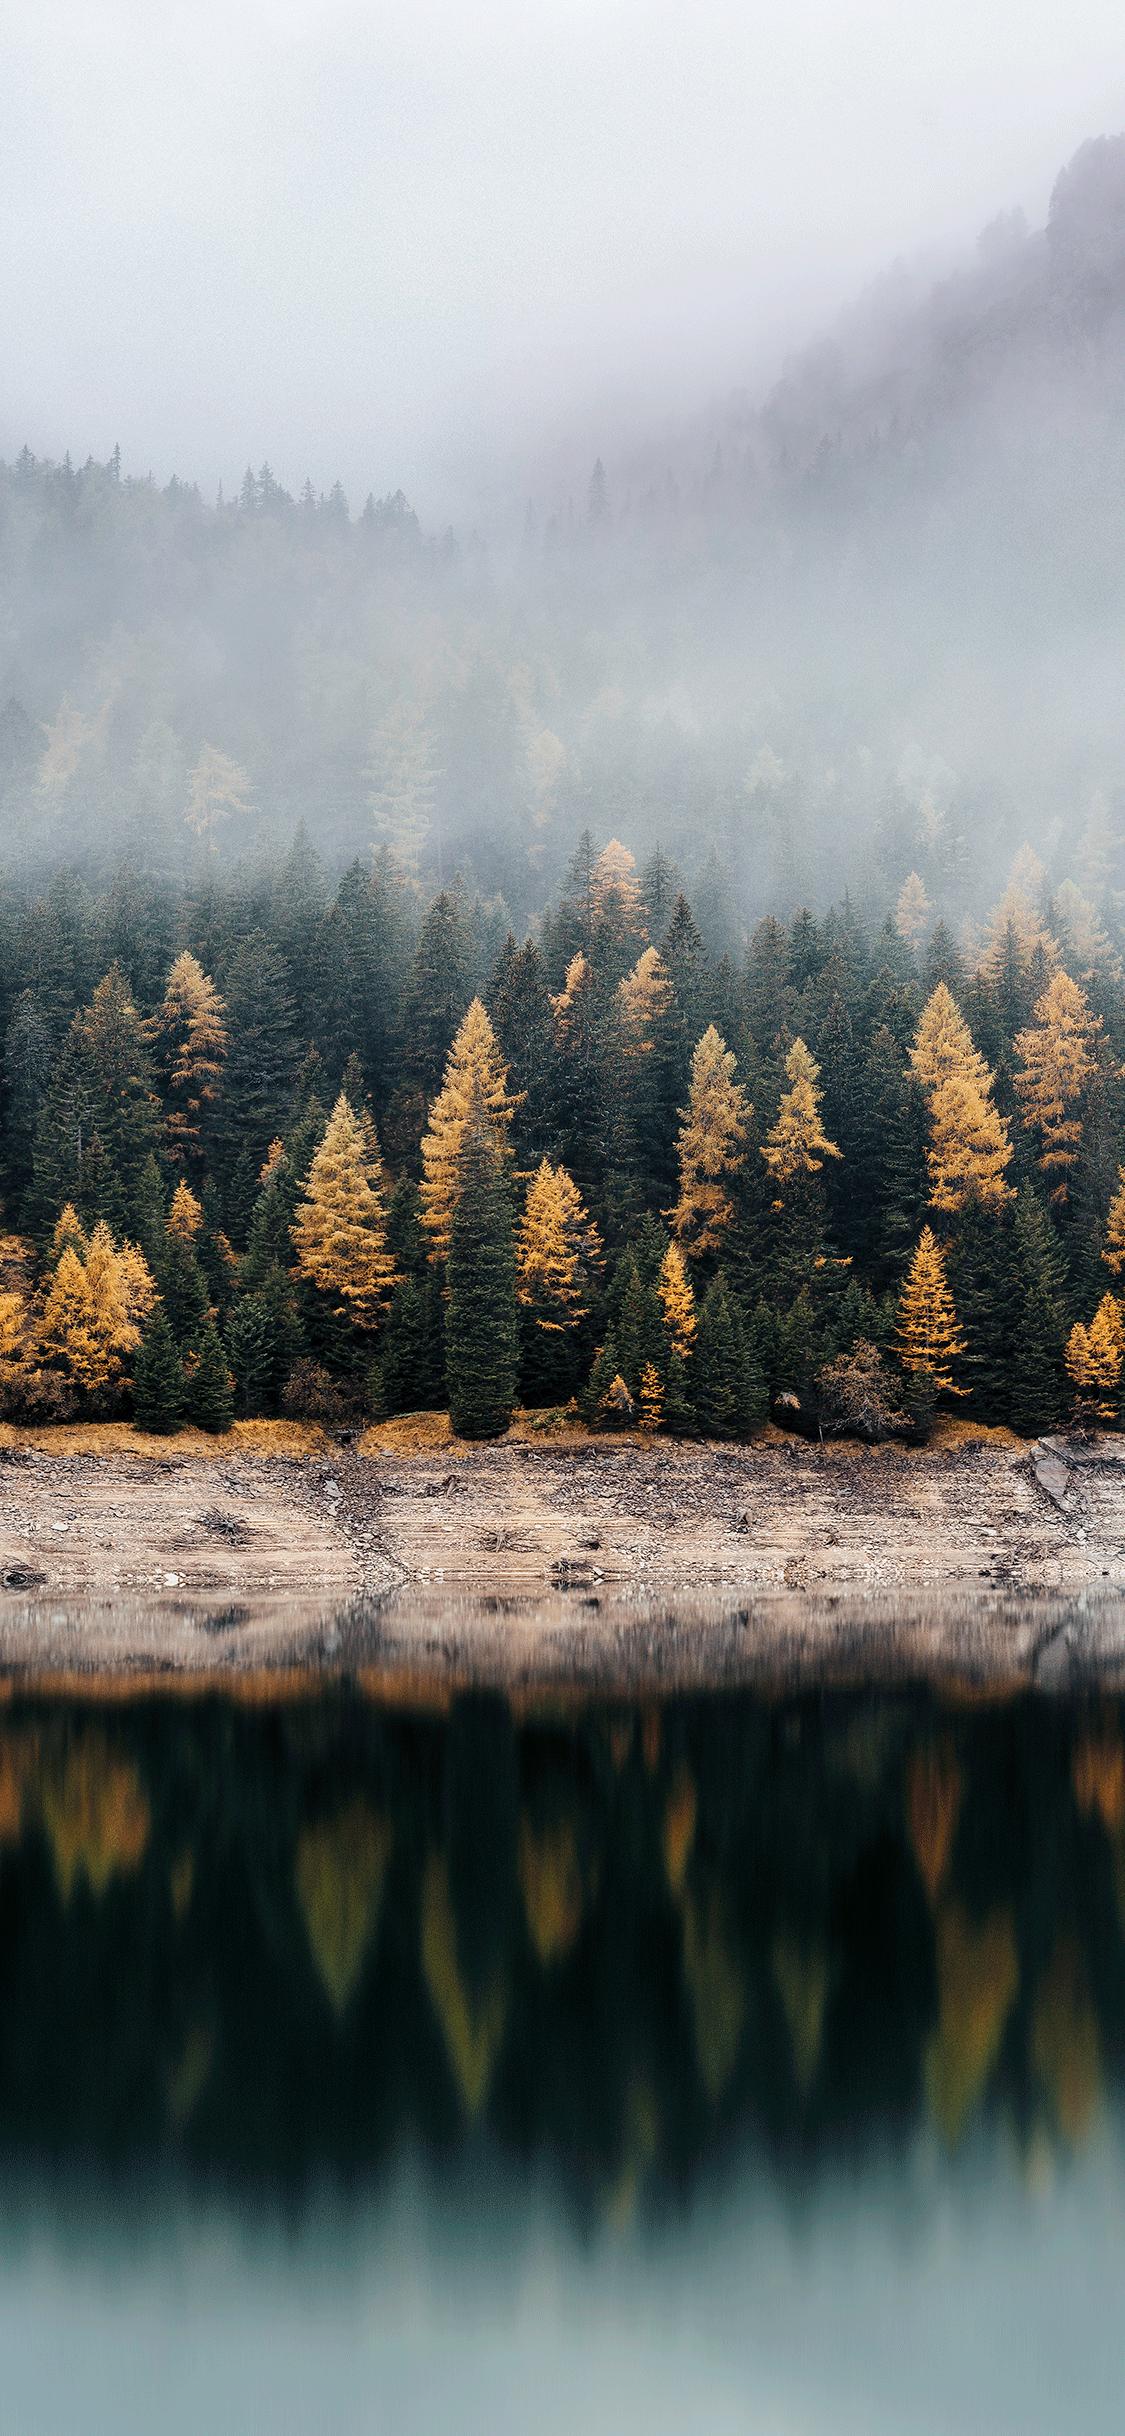 iPhone wallpaper forest fog Fonds d'écran iPhone du 14/08/2018